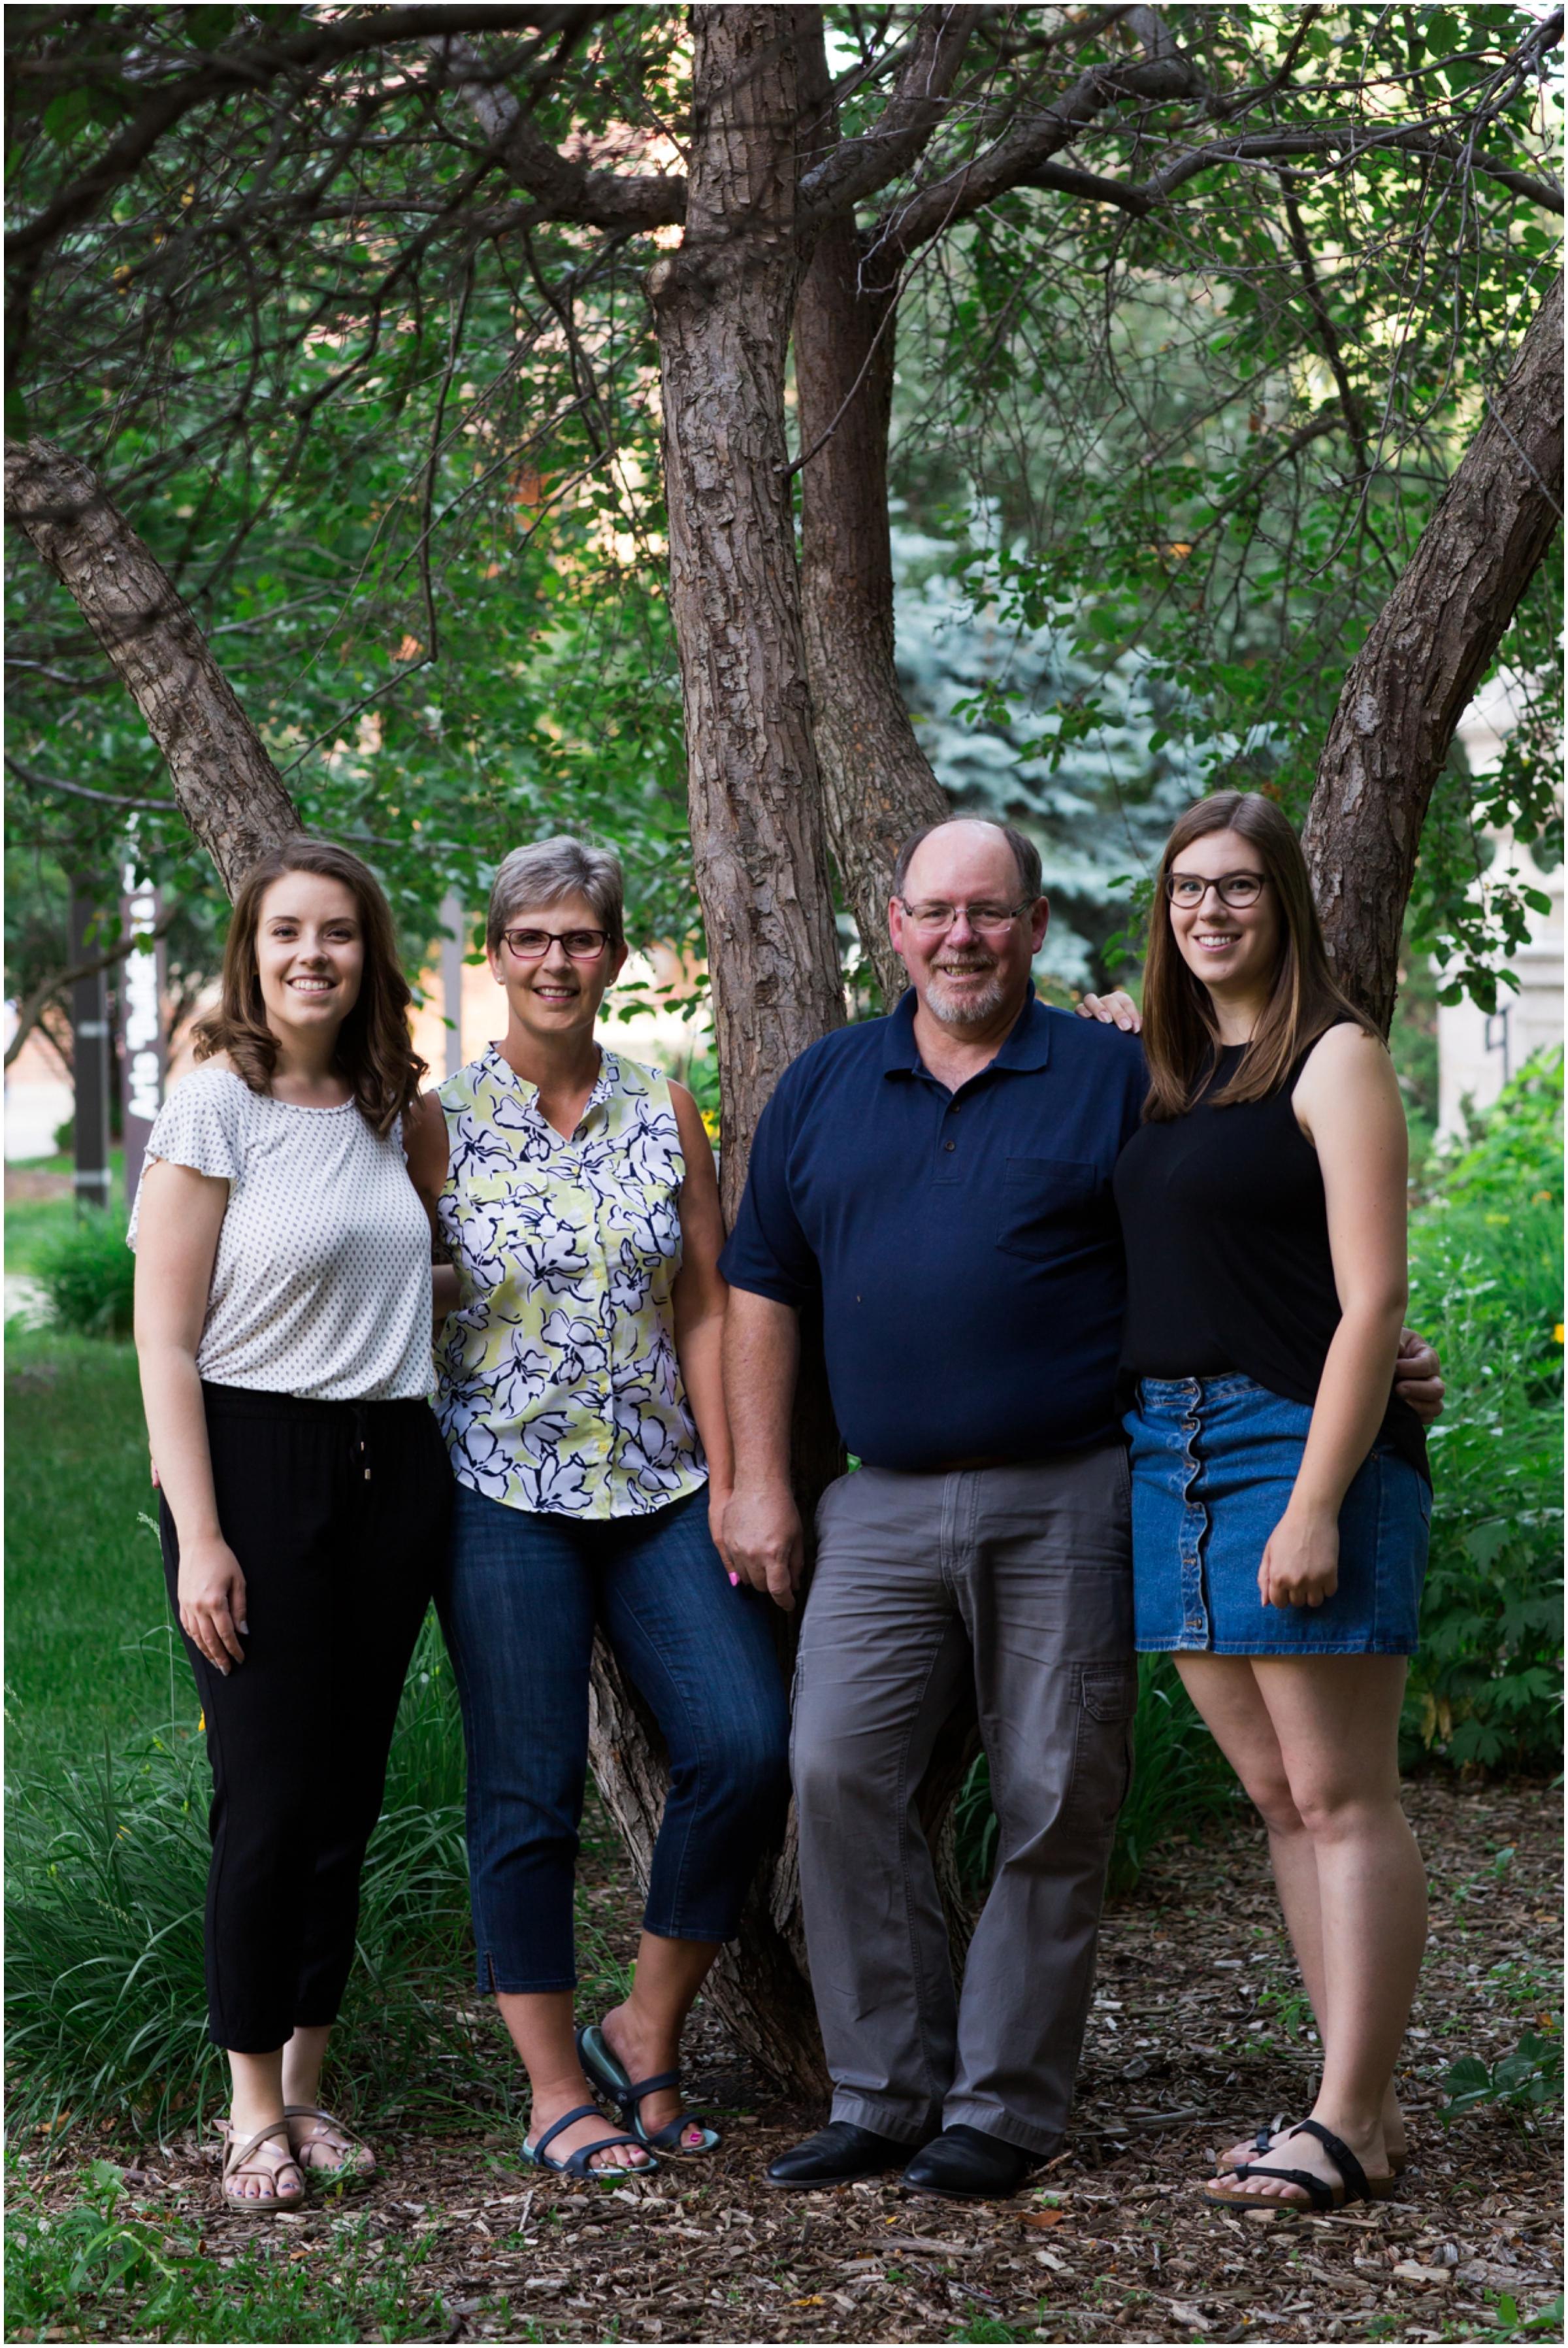 Edmonton Family Photo Session - (Selena Phillips-Boyle)_0023.jpg